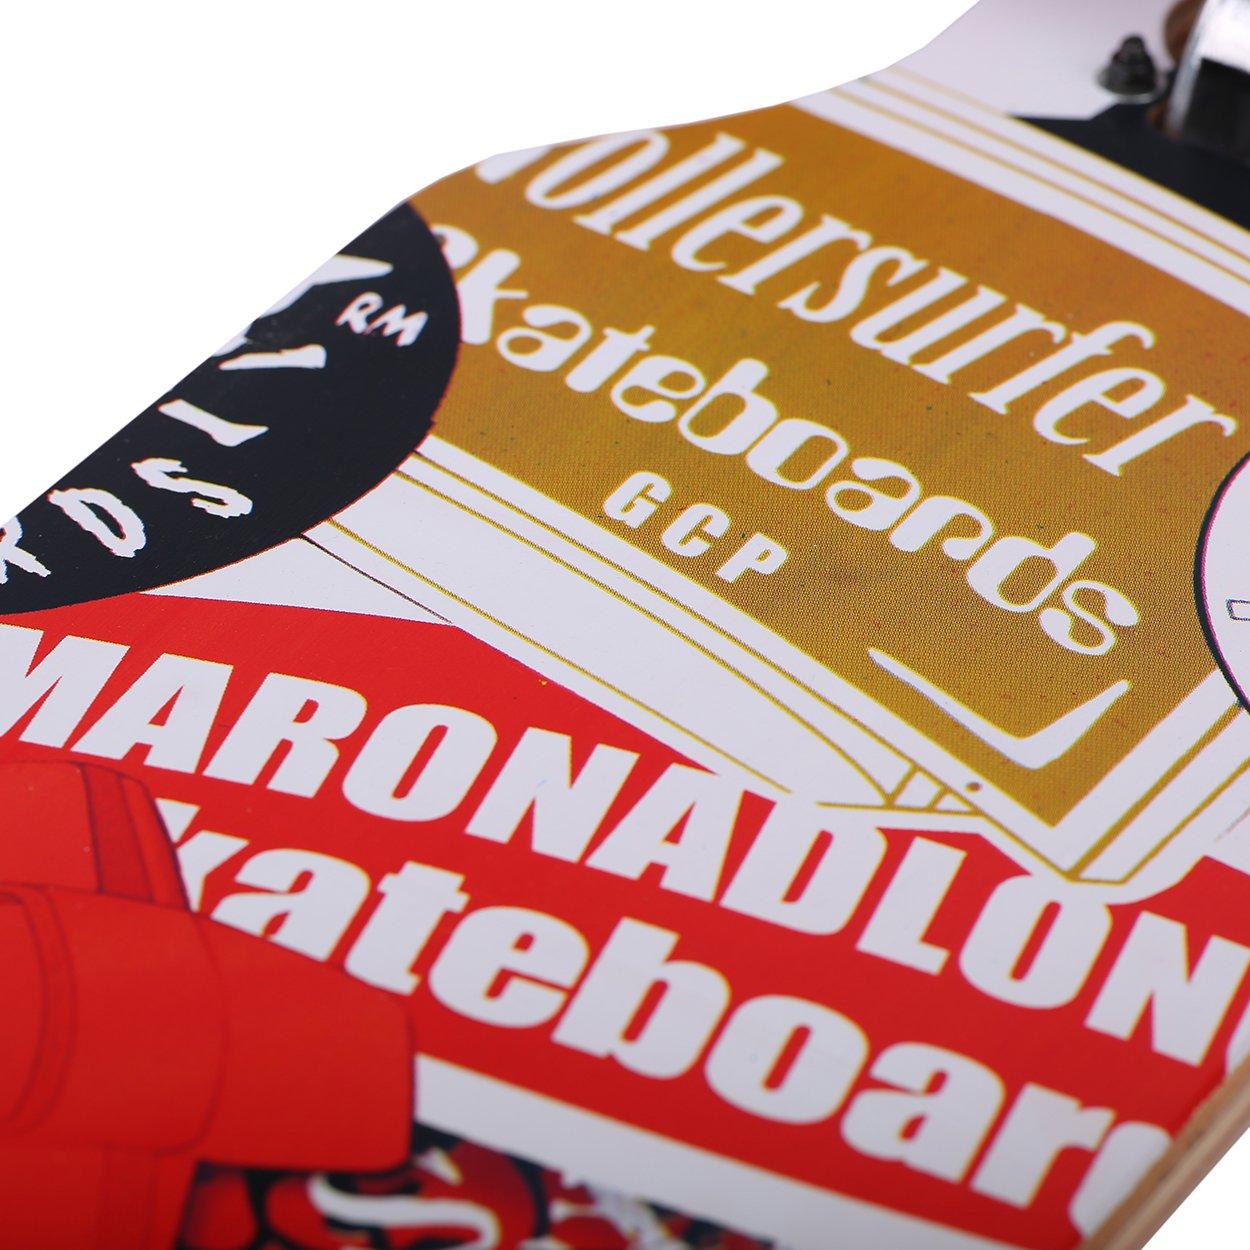 Longboard Skateboard MARONAD drop through Race Cruiser ABEC-11 Skateboard 104x24 cm Streetsurfer patinar FUN Modell Cruiser Aruba